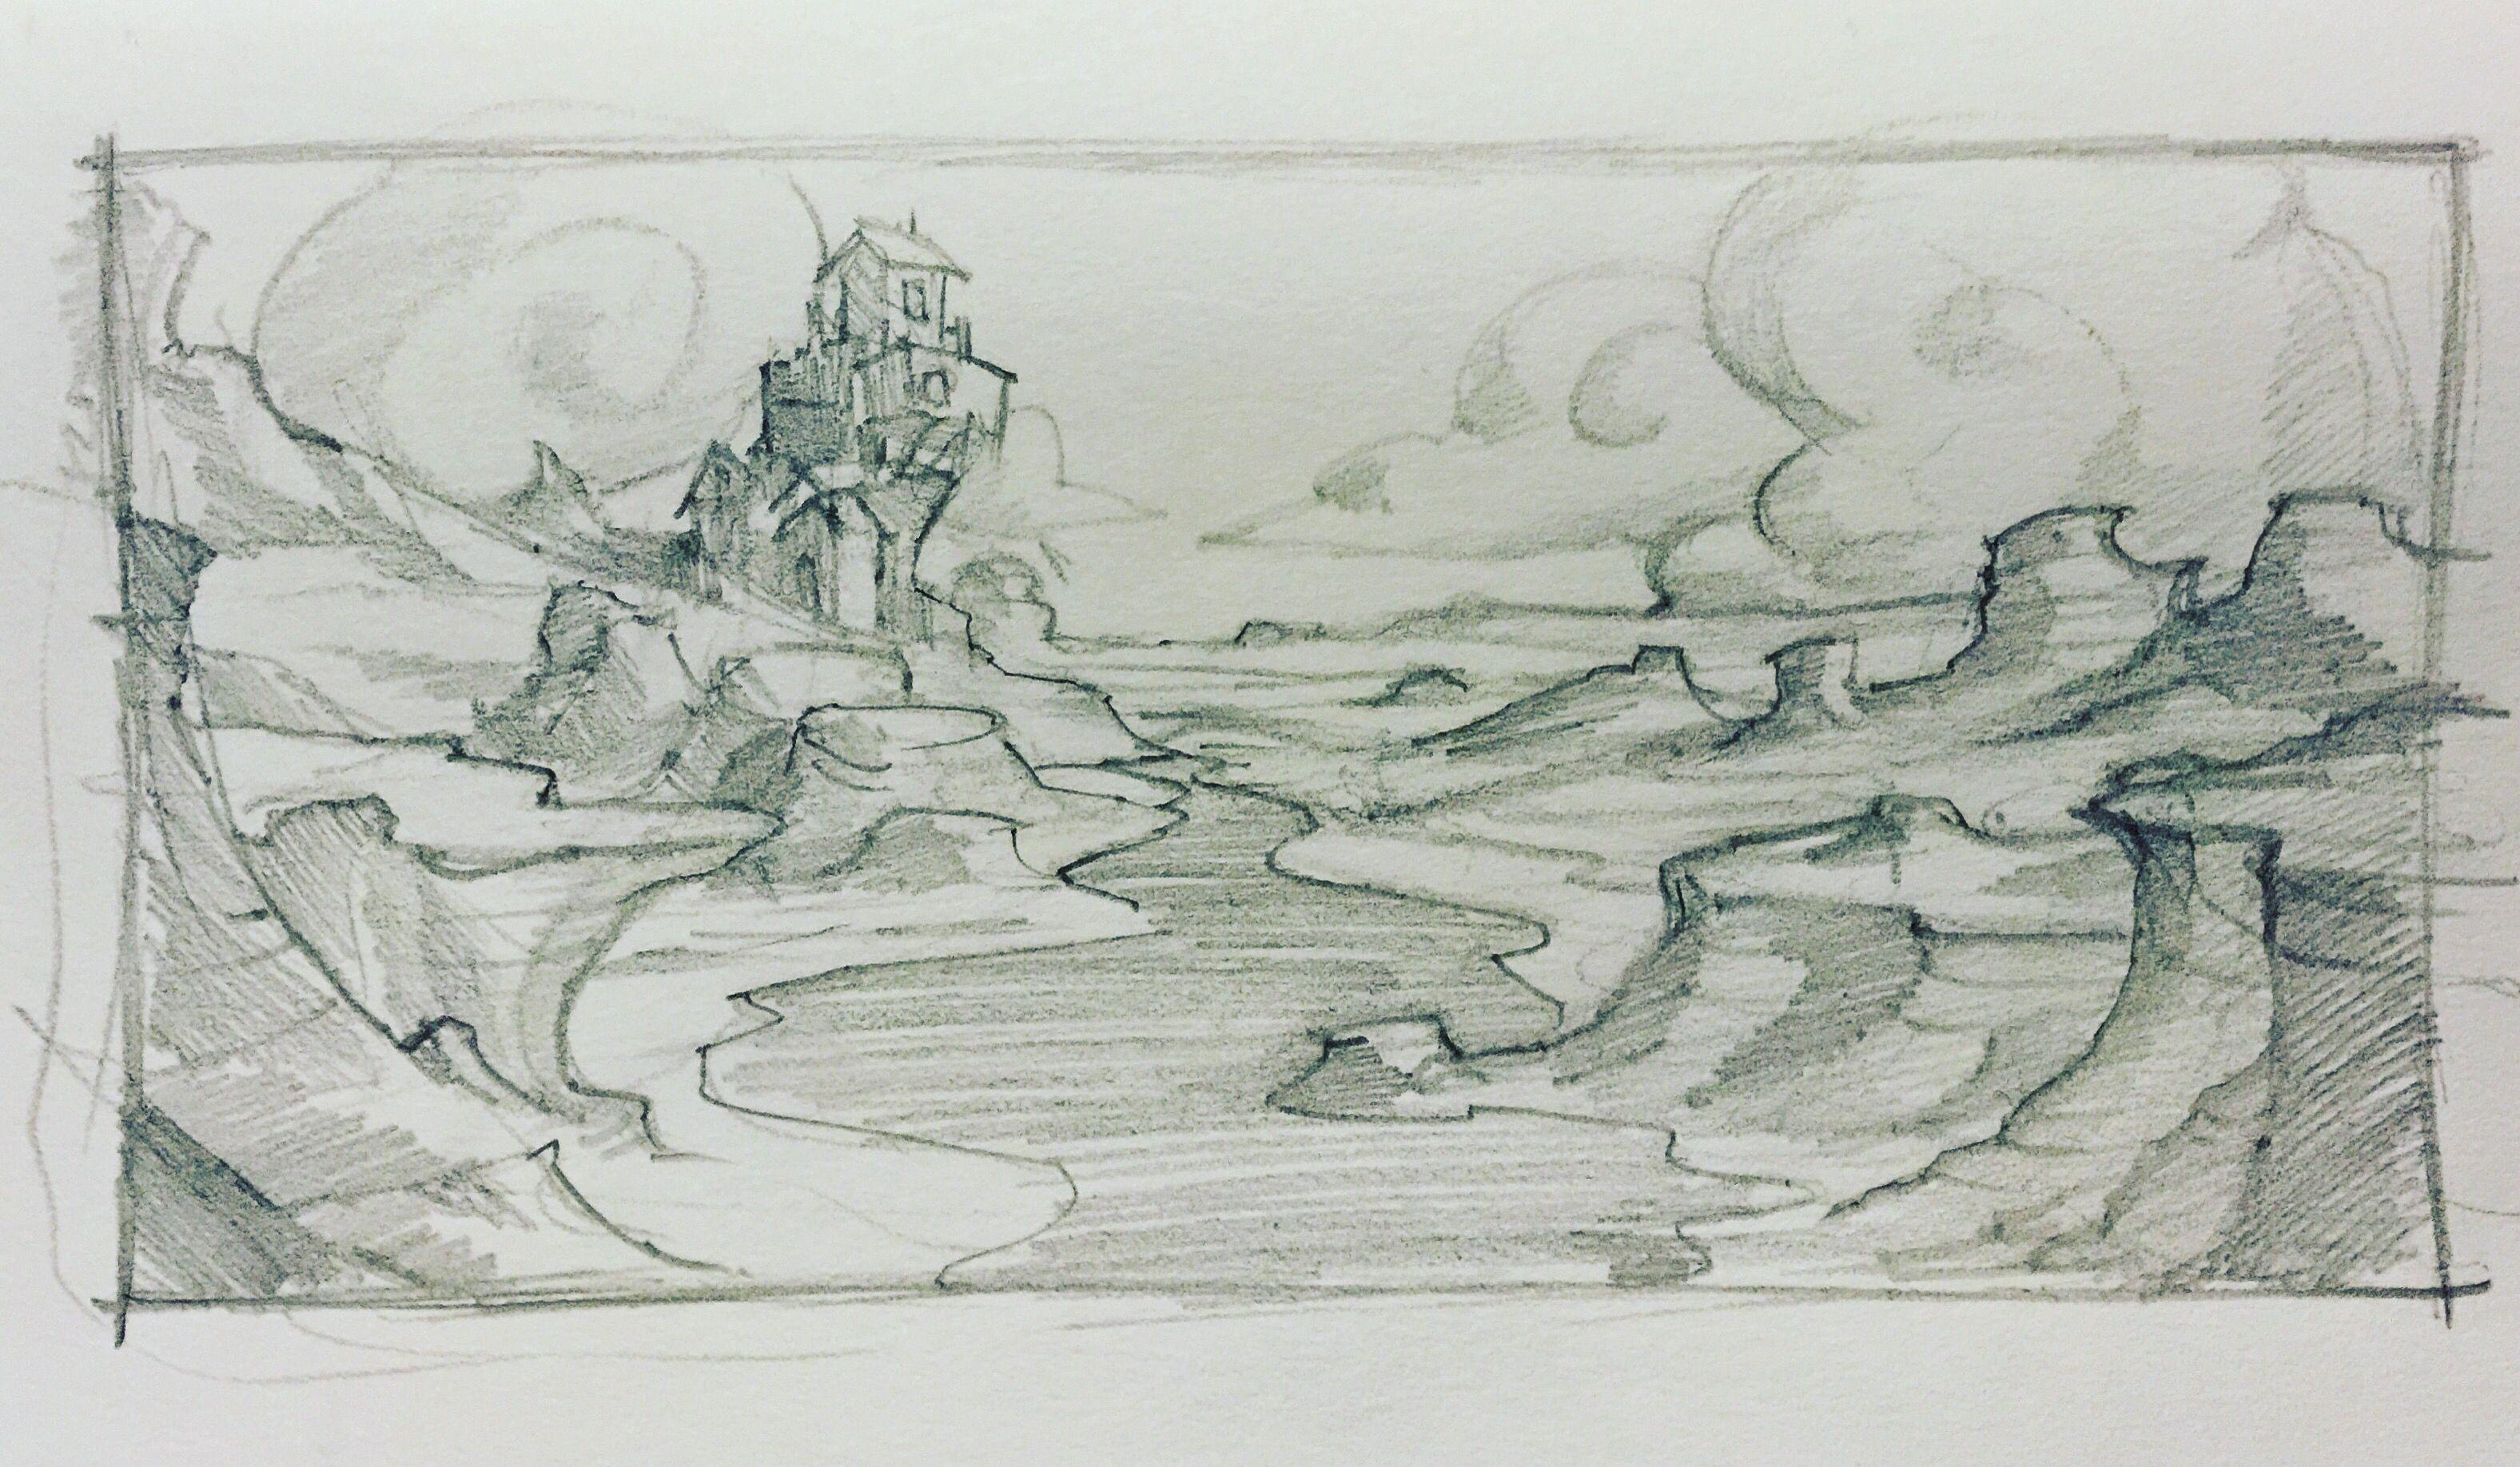 2 cartoon animated background landscape scene pencil sketch drawing clouds fort base mikephillipsart